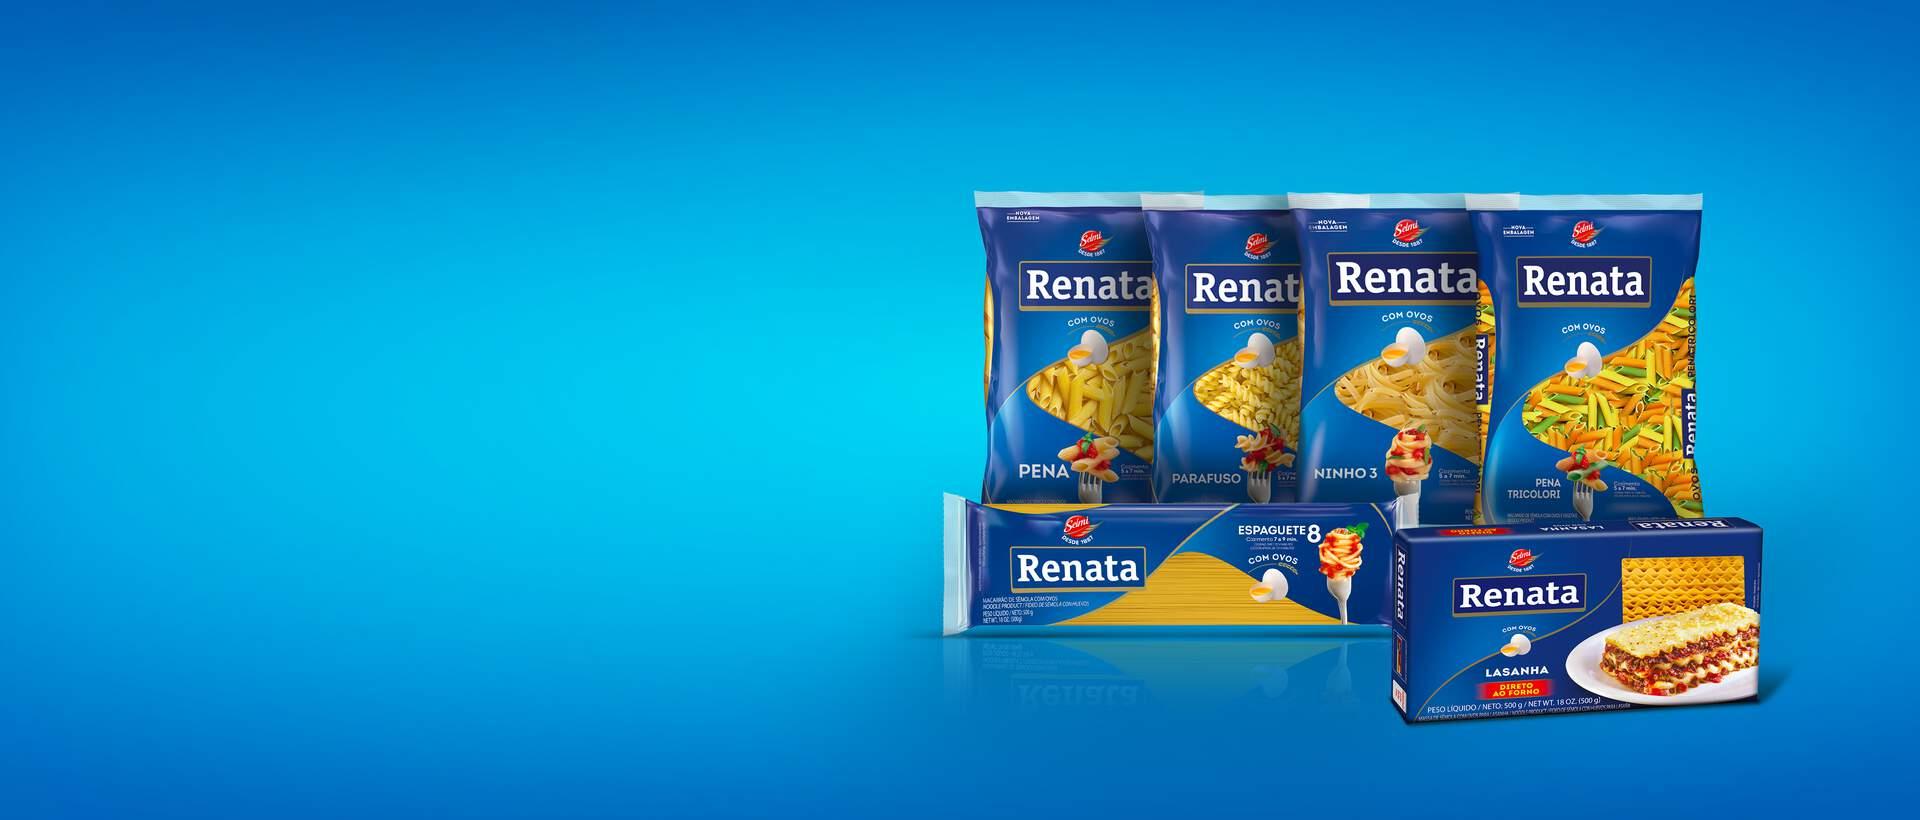 Banner Renata Pasta With Eggs